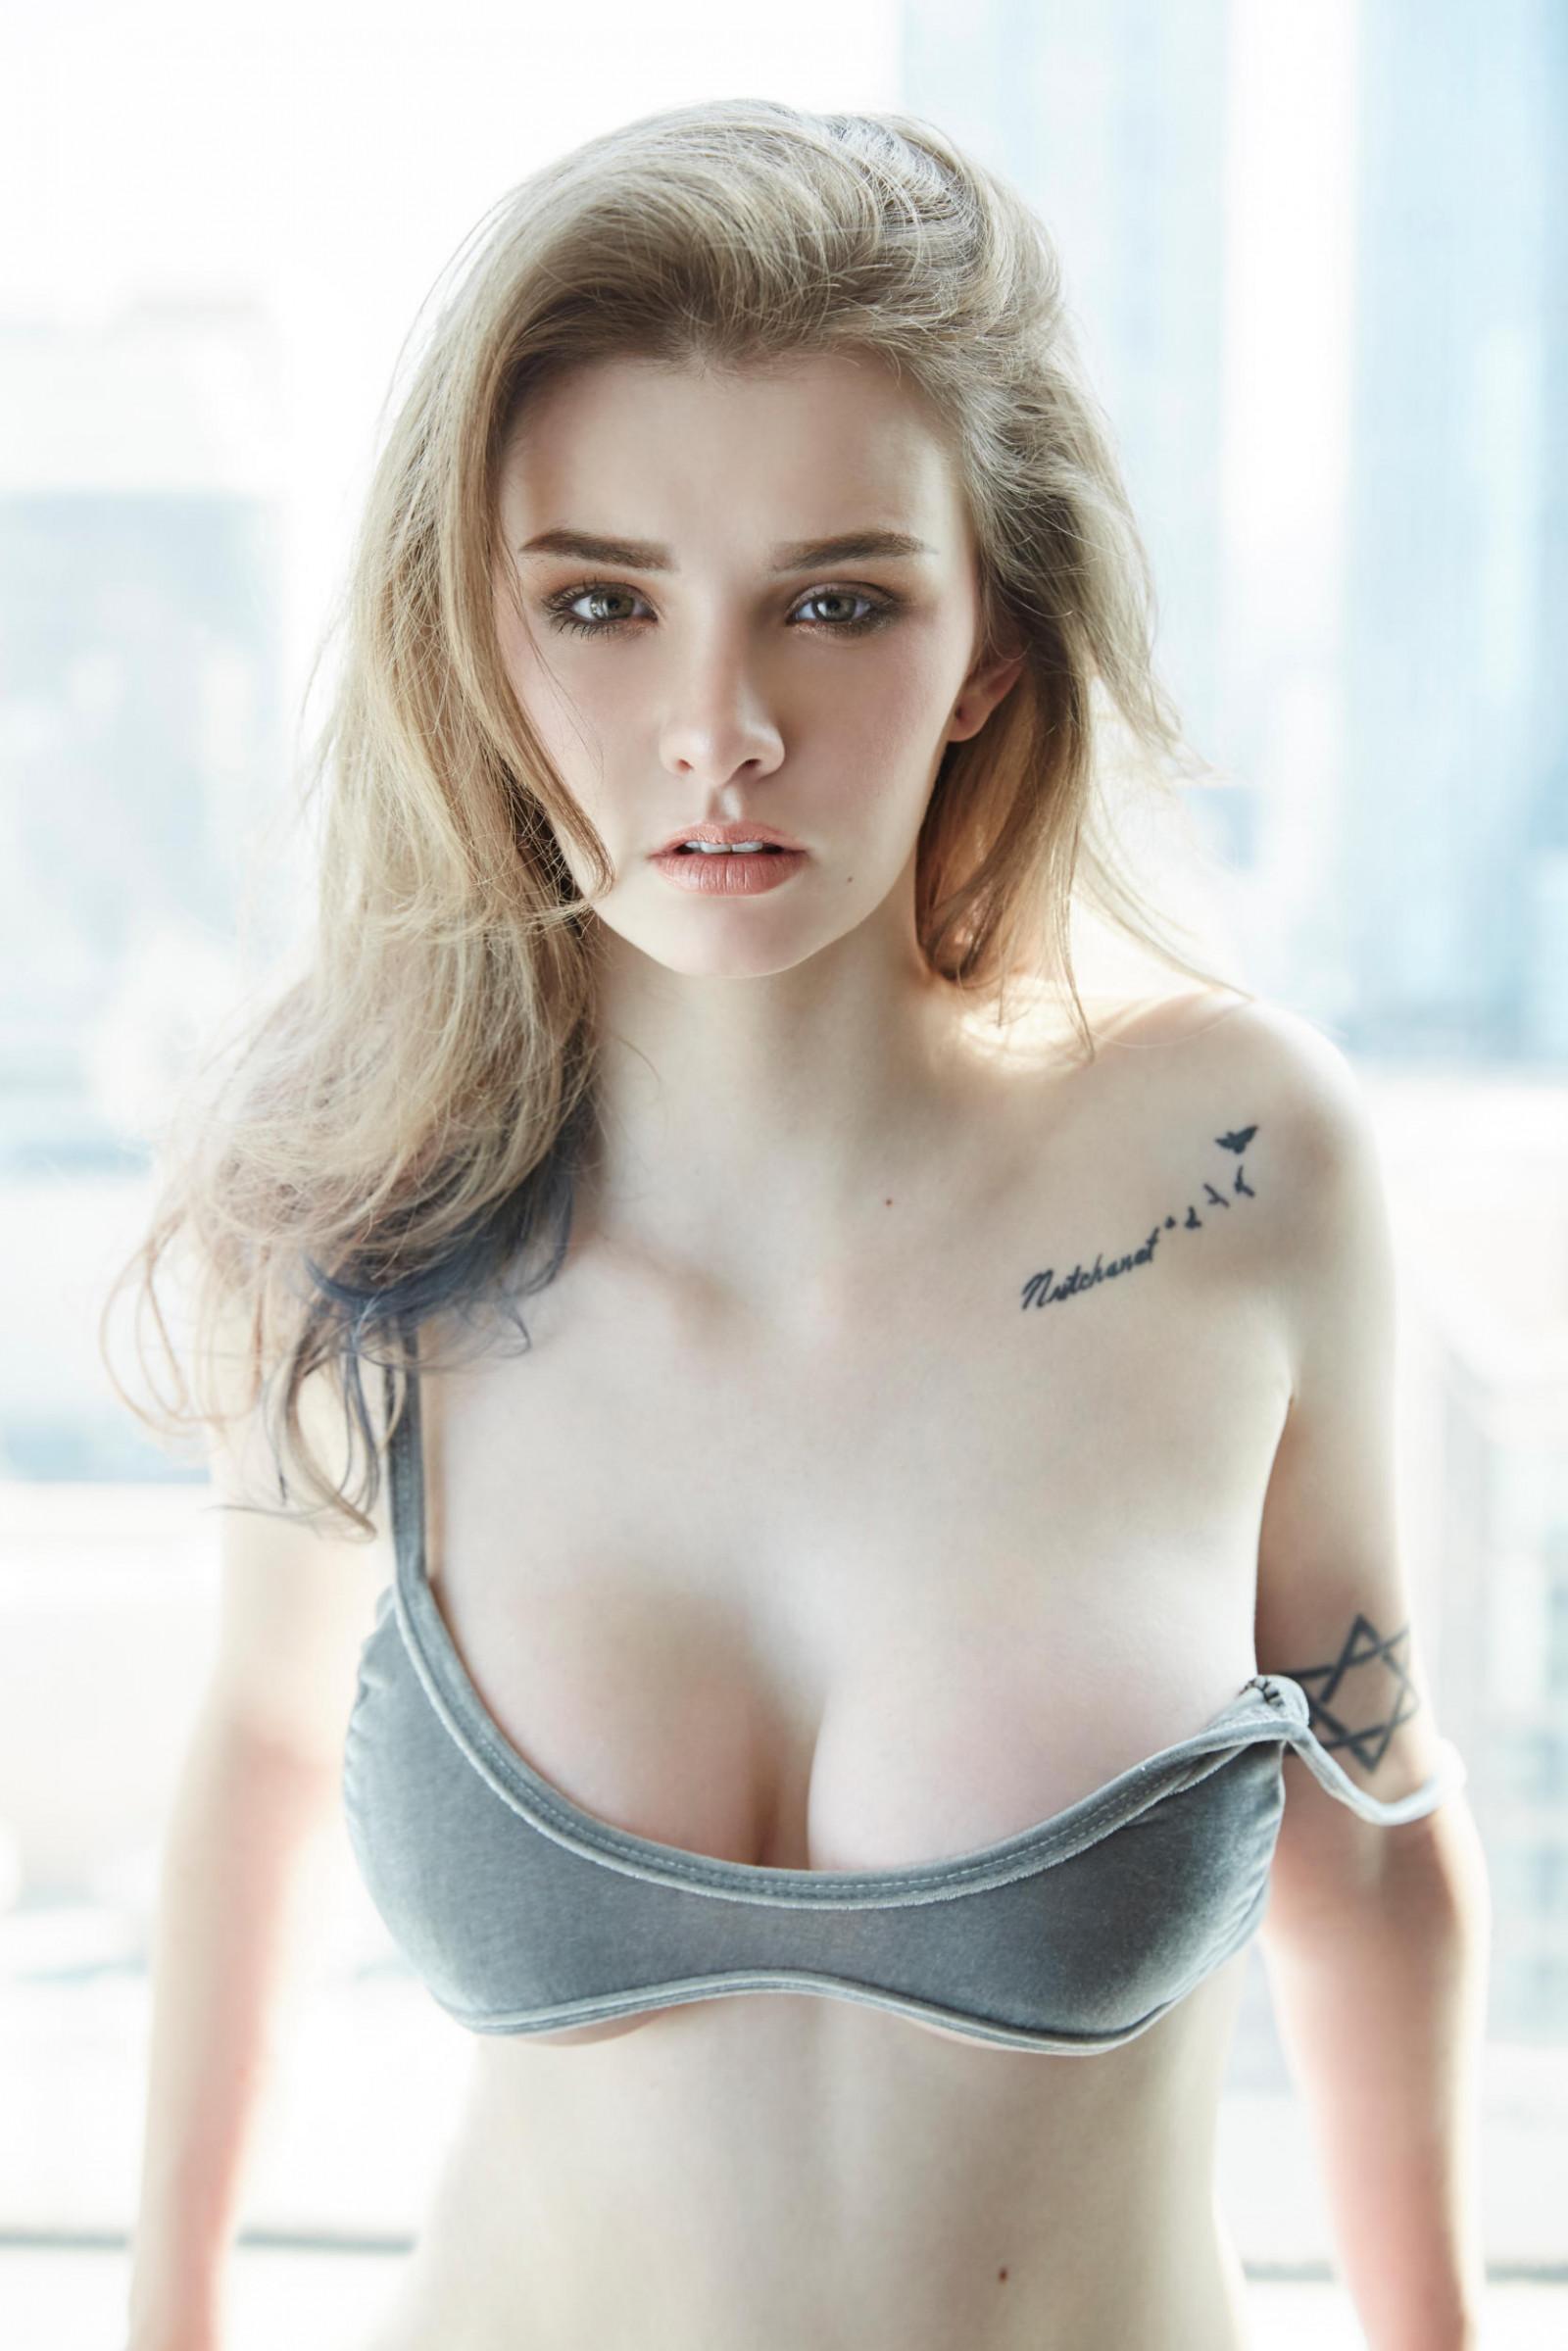 Wallpaper  Jessie Vard, Natural Boobs, White Skin, Women -2235